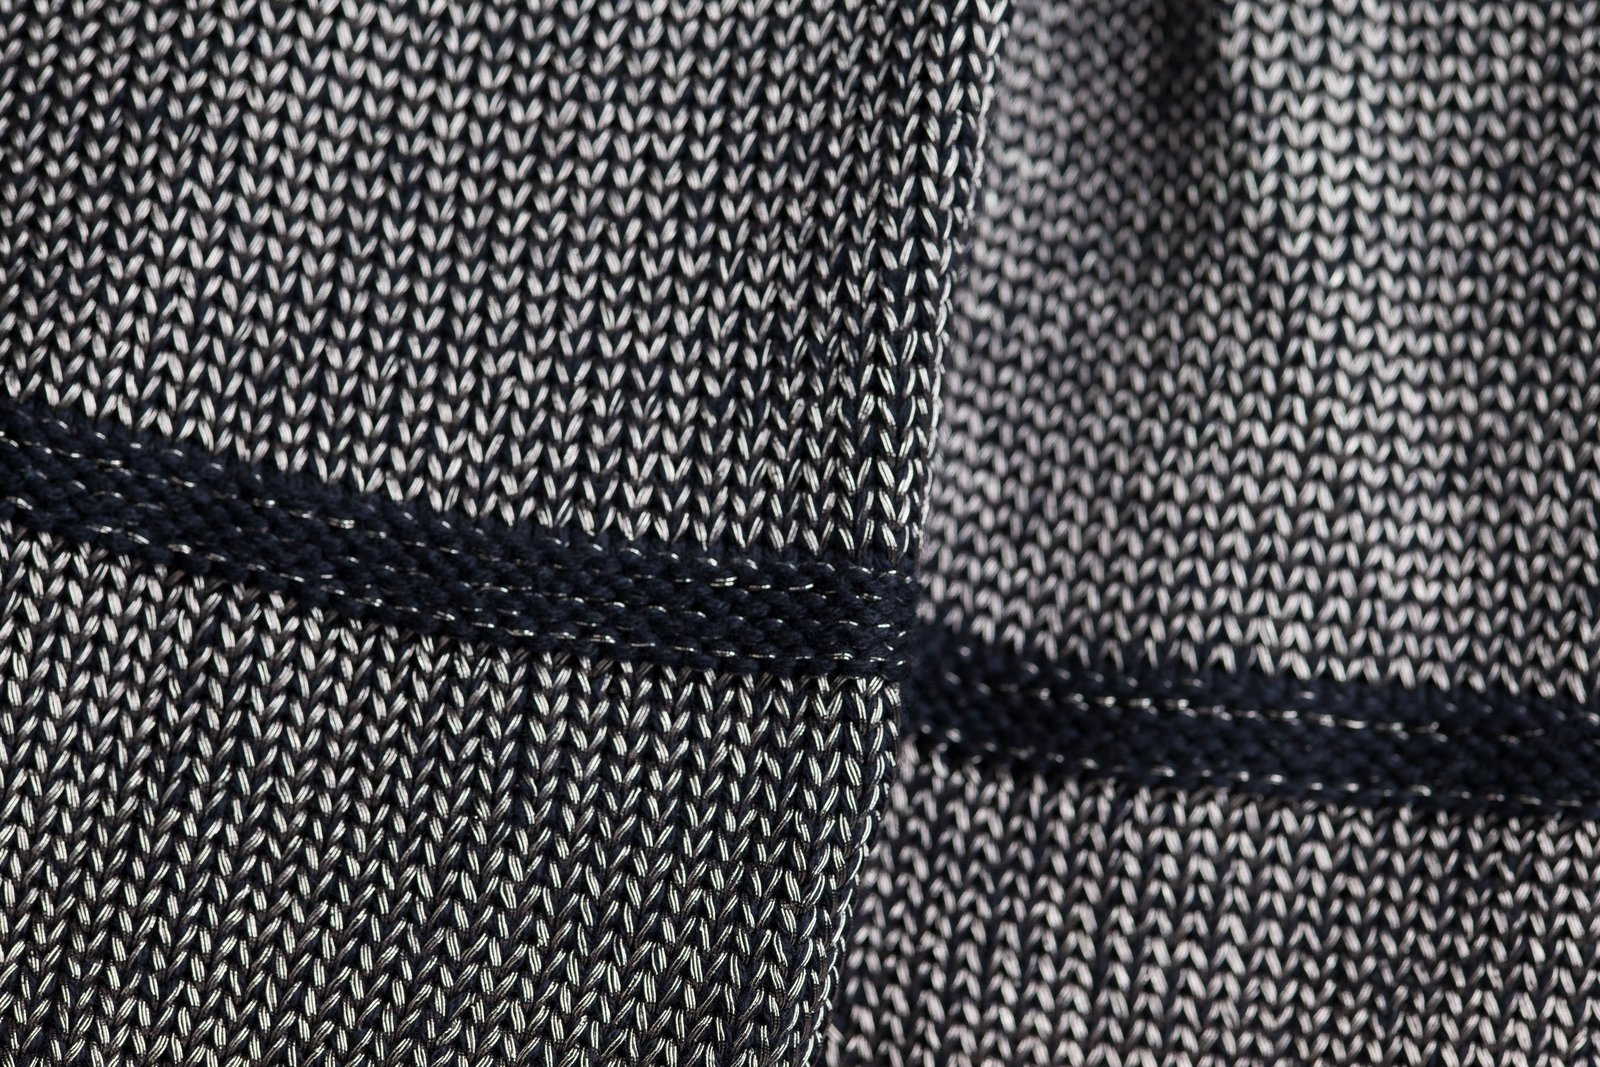 Jil Sander - Details (1 of 2).jpg